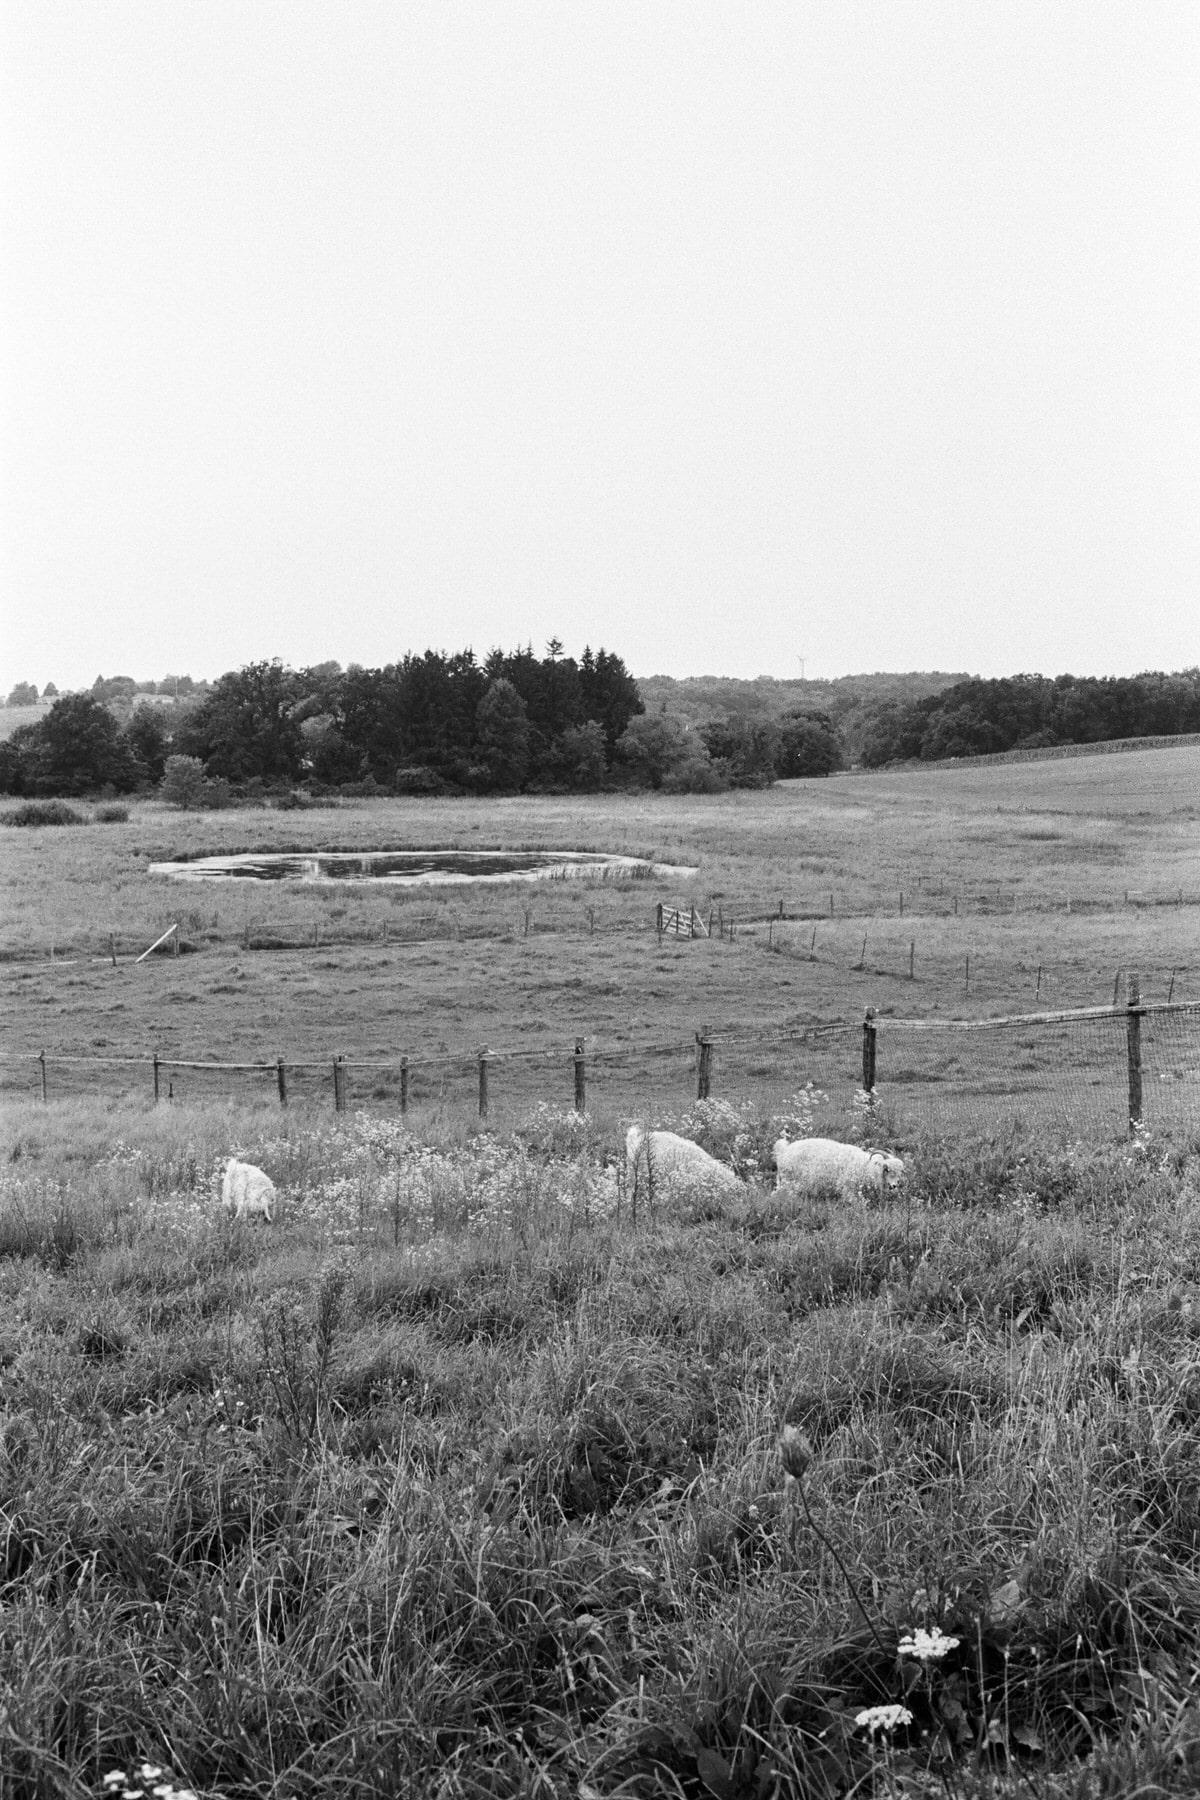 Cristo-Rey-Ranch-Wisconsin-black-and-white-fine-art-photography-by-Studio-L-photographer-Laura-Schneider-_0031